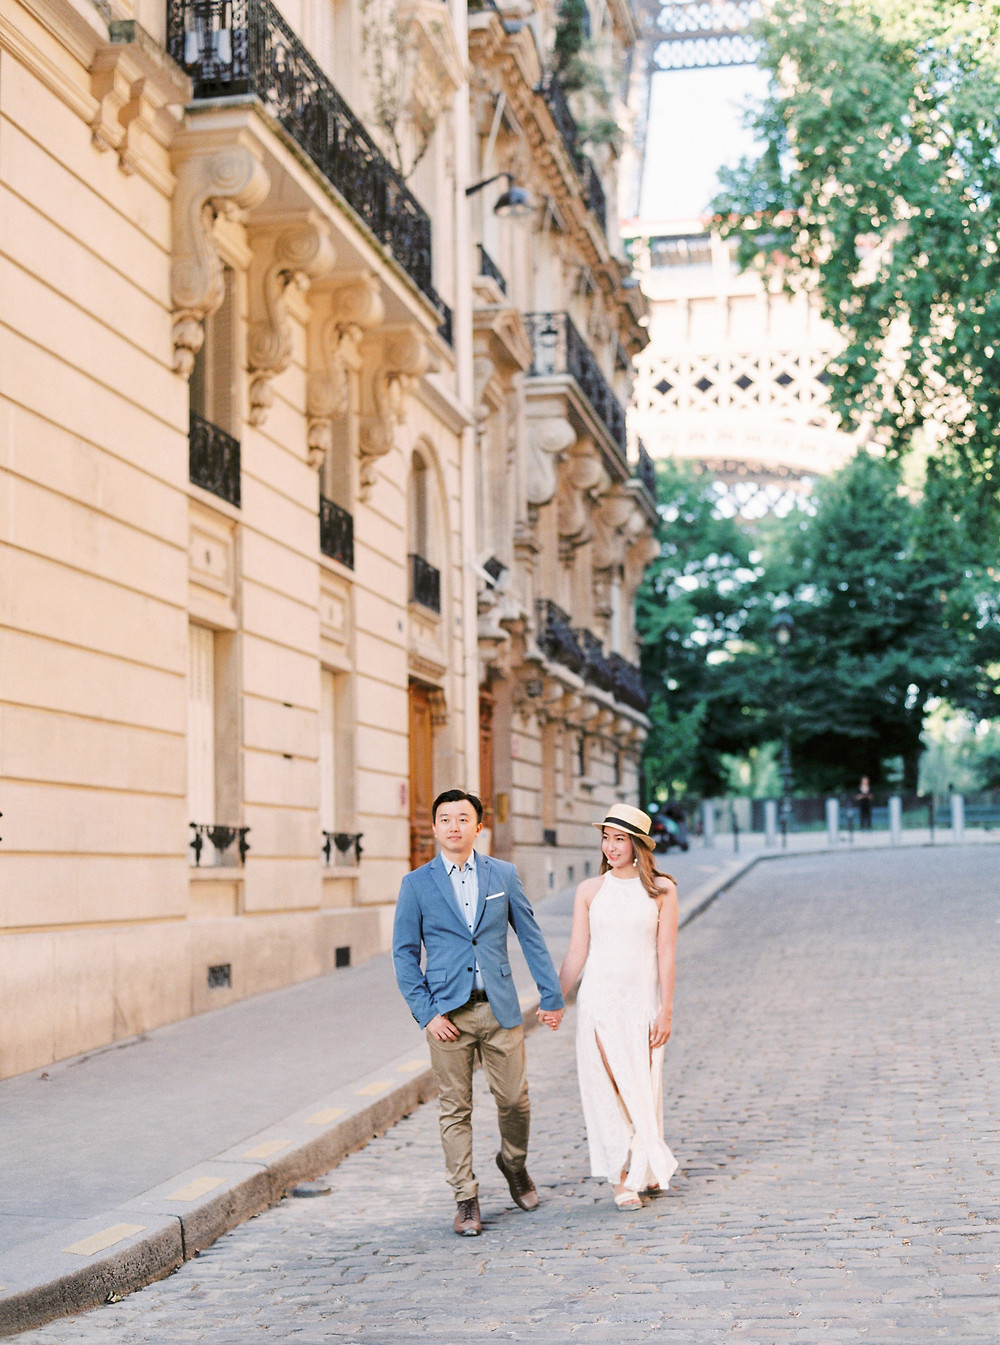 What to visit in Paris